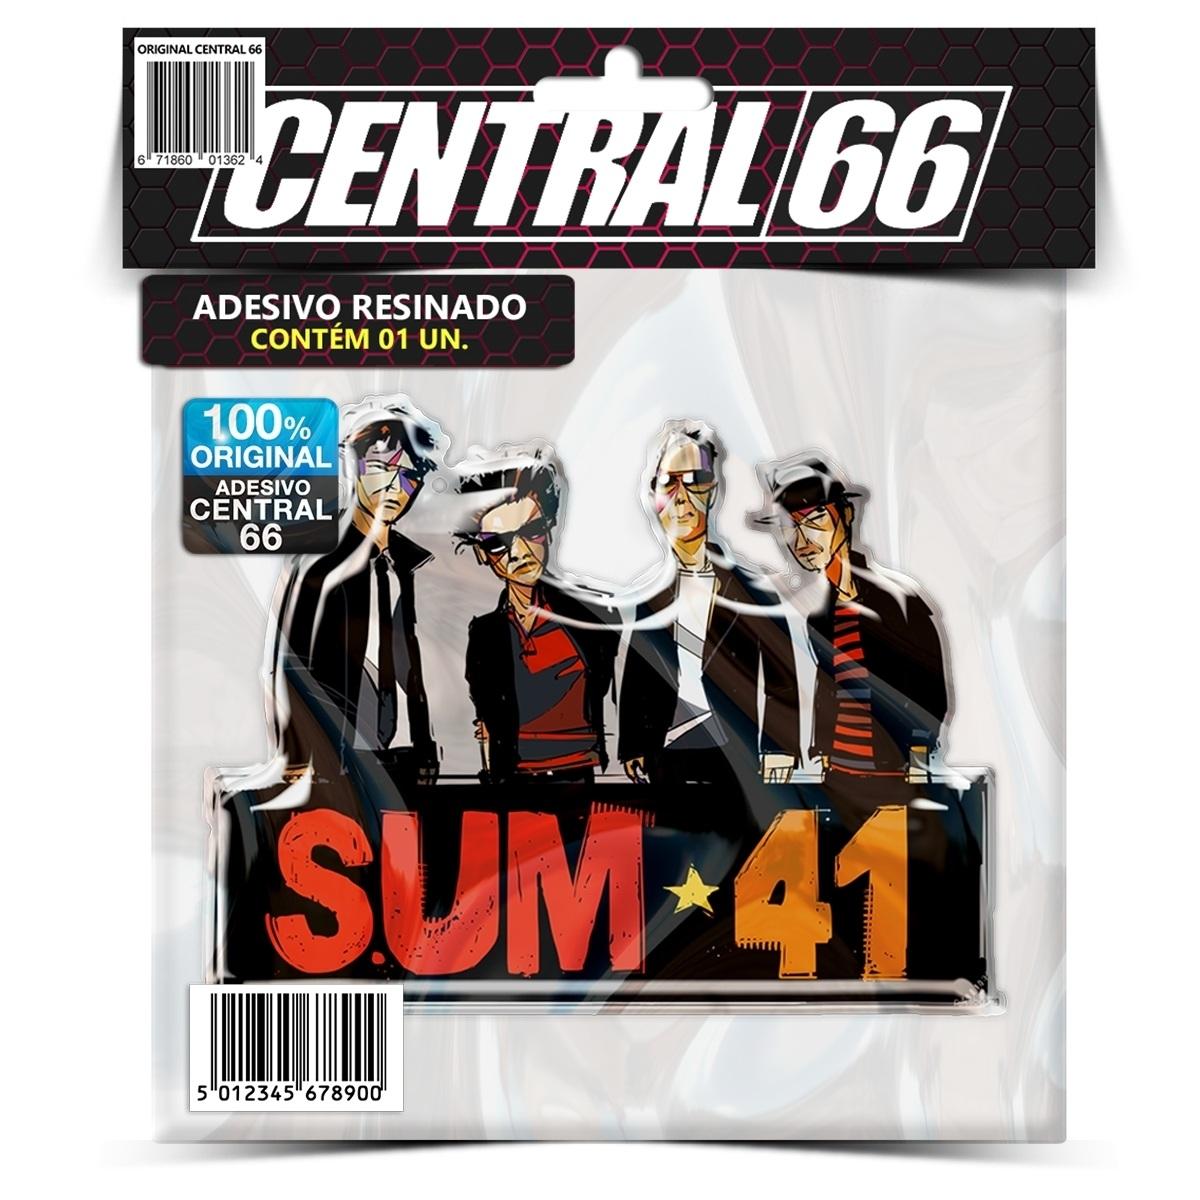 Adesivo Banda Sum 41 M02 – Central 66